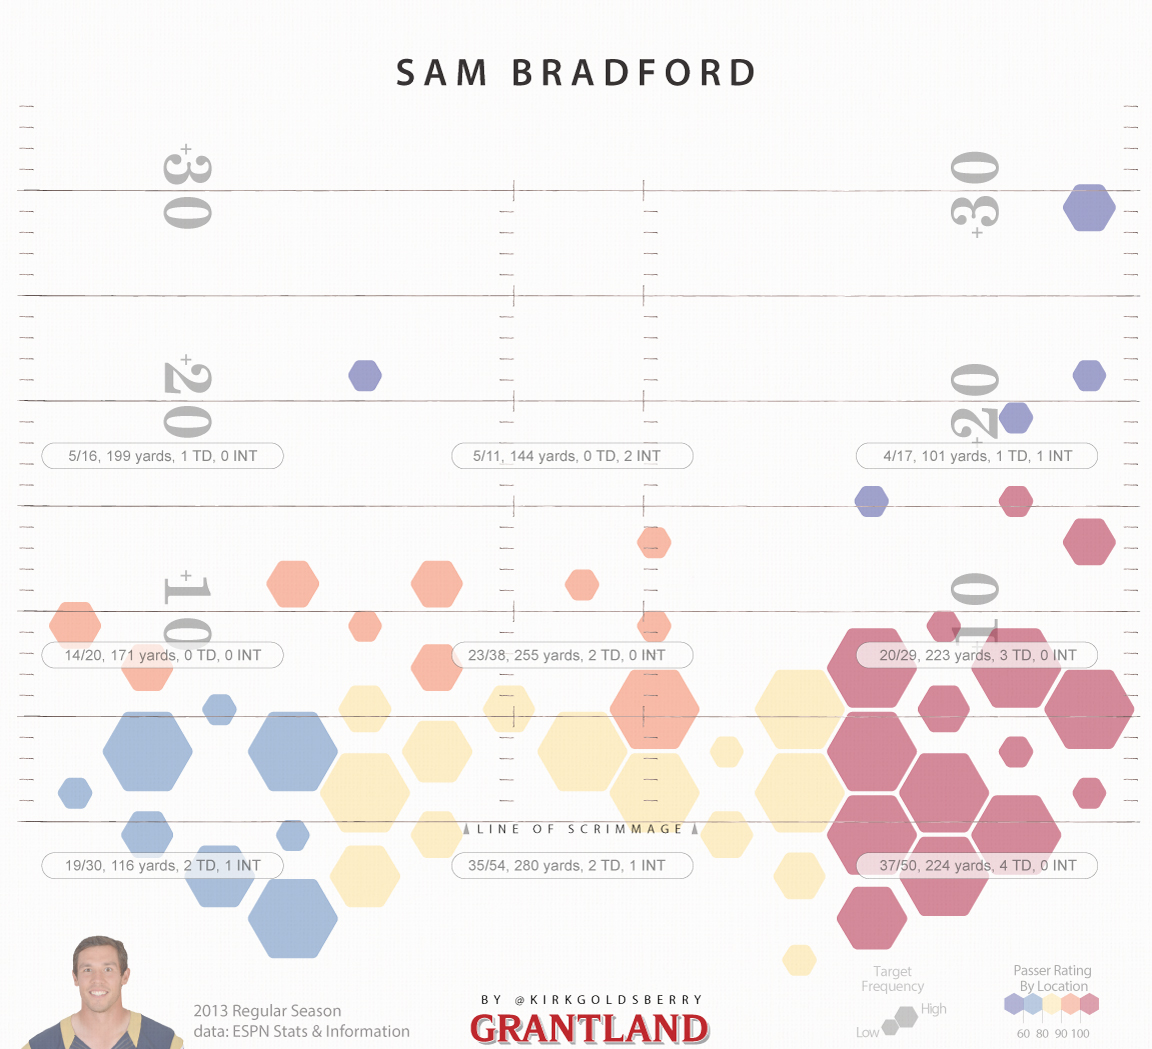 SamBradford_1152